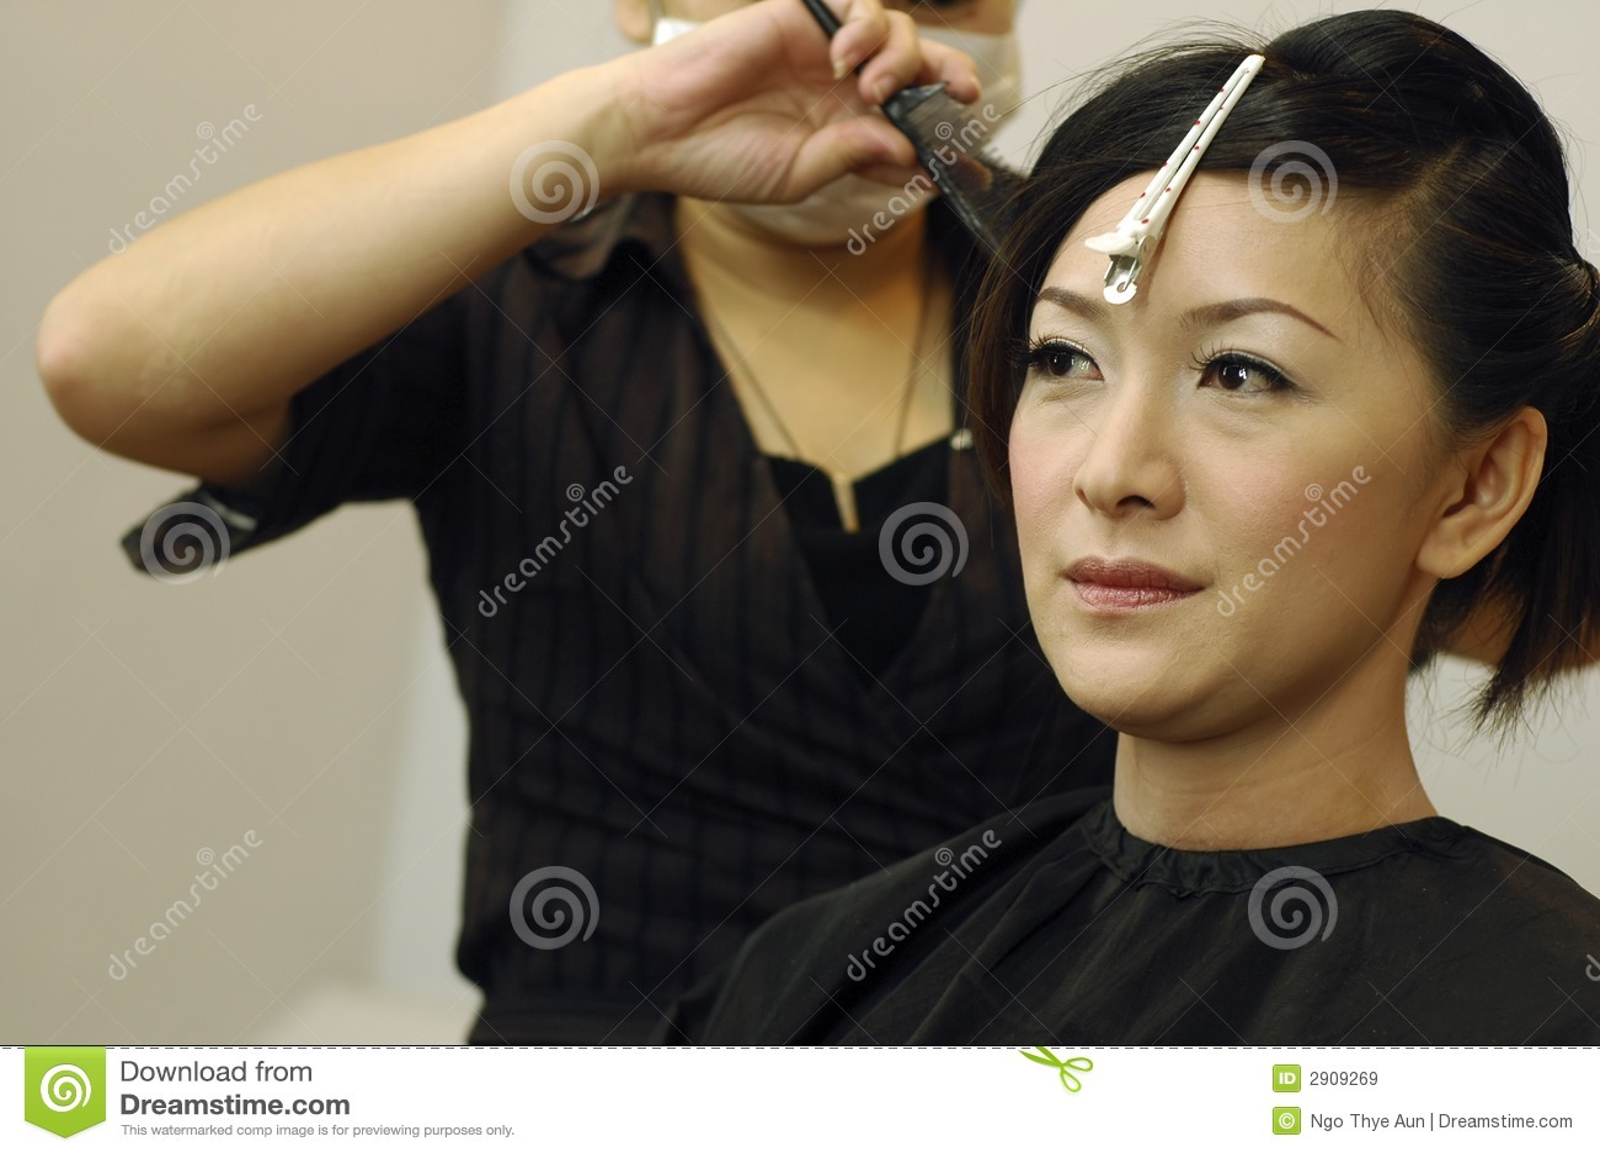 Hair Salon stock image. Image of asian, fashionable ...